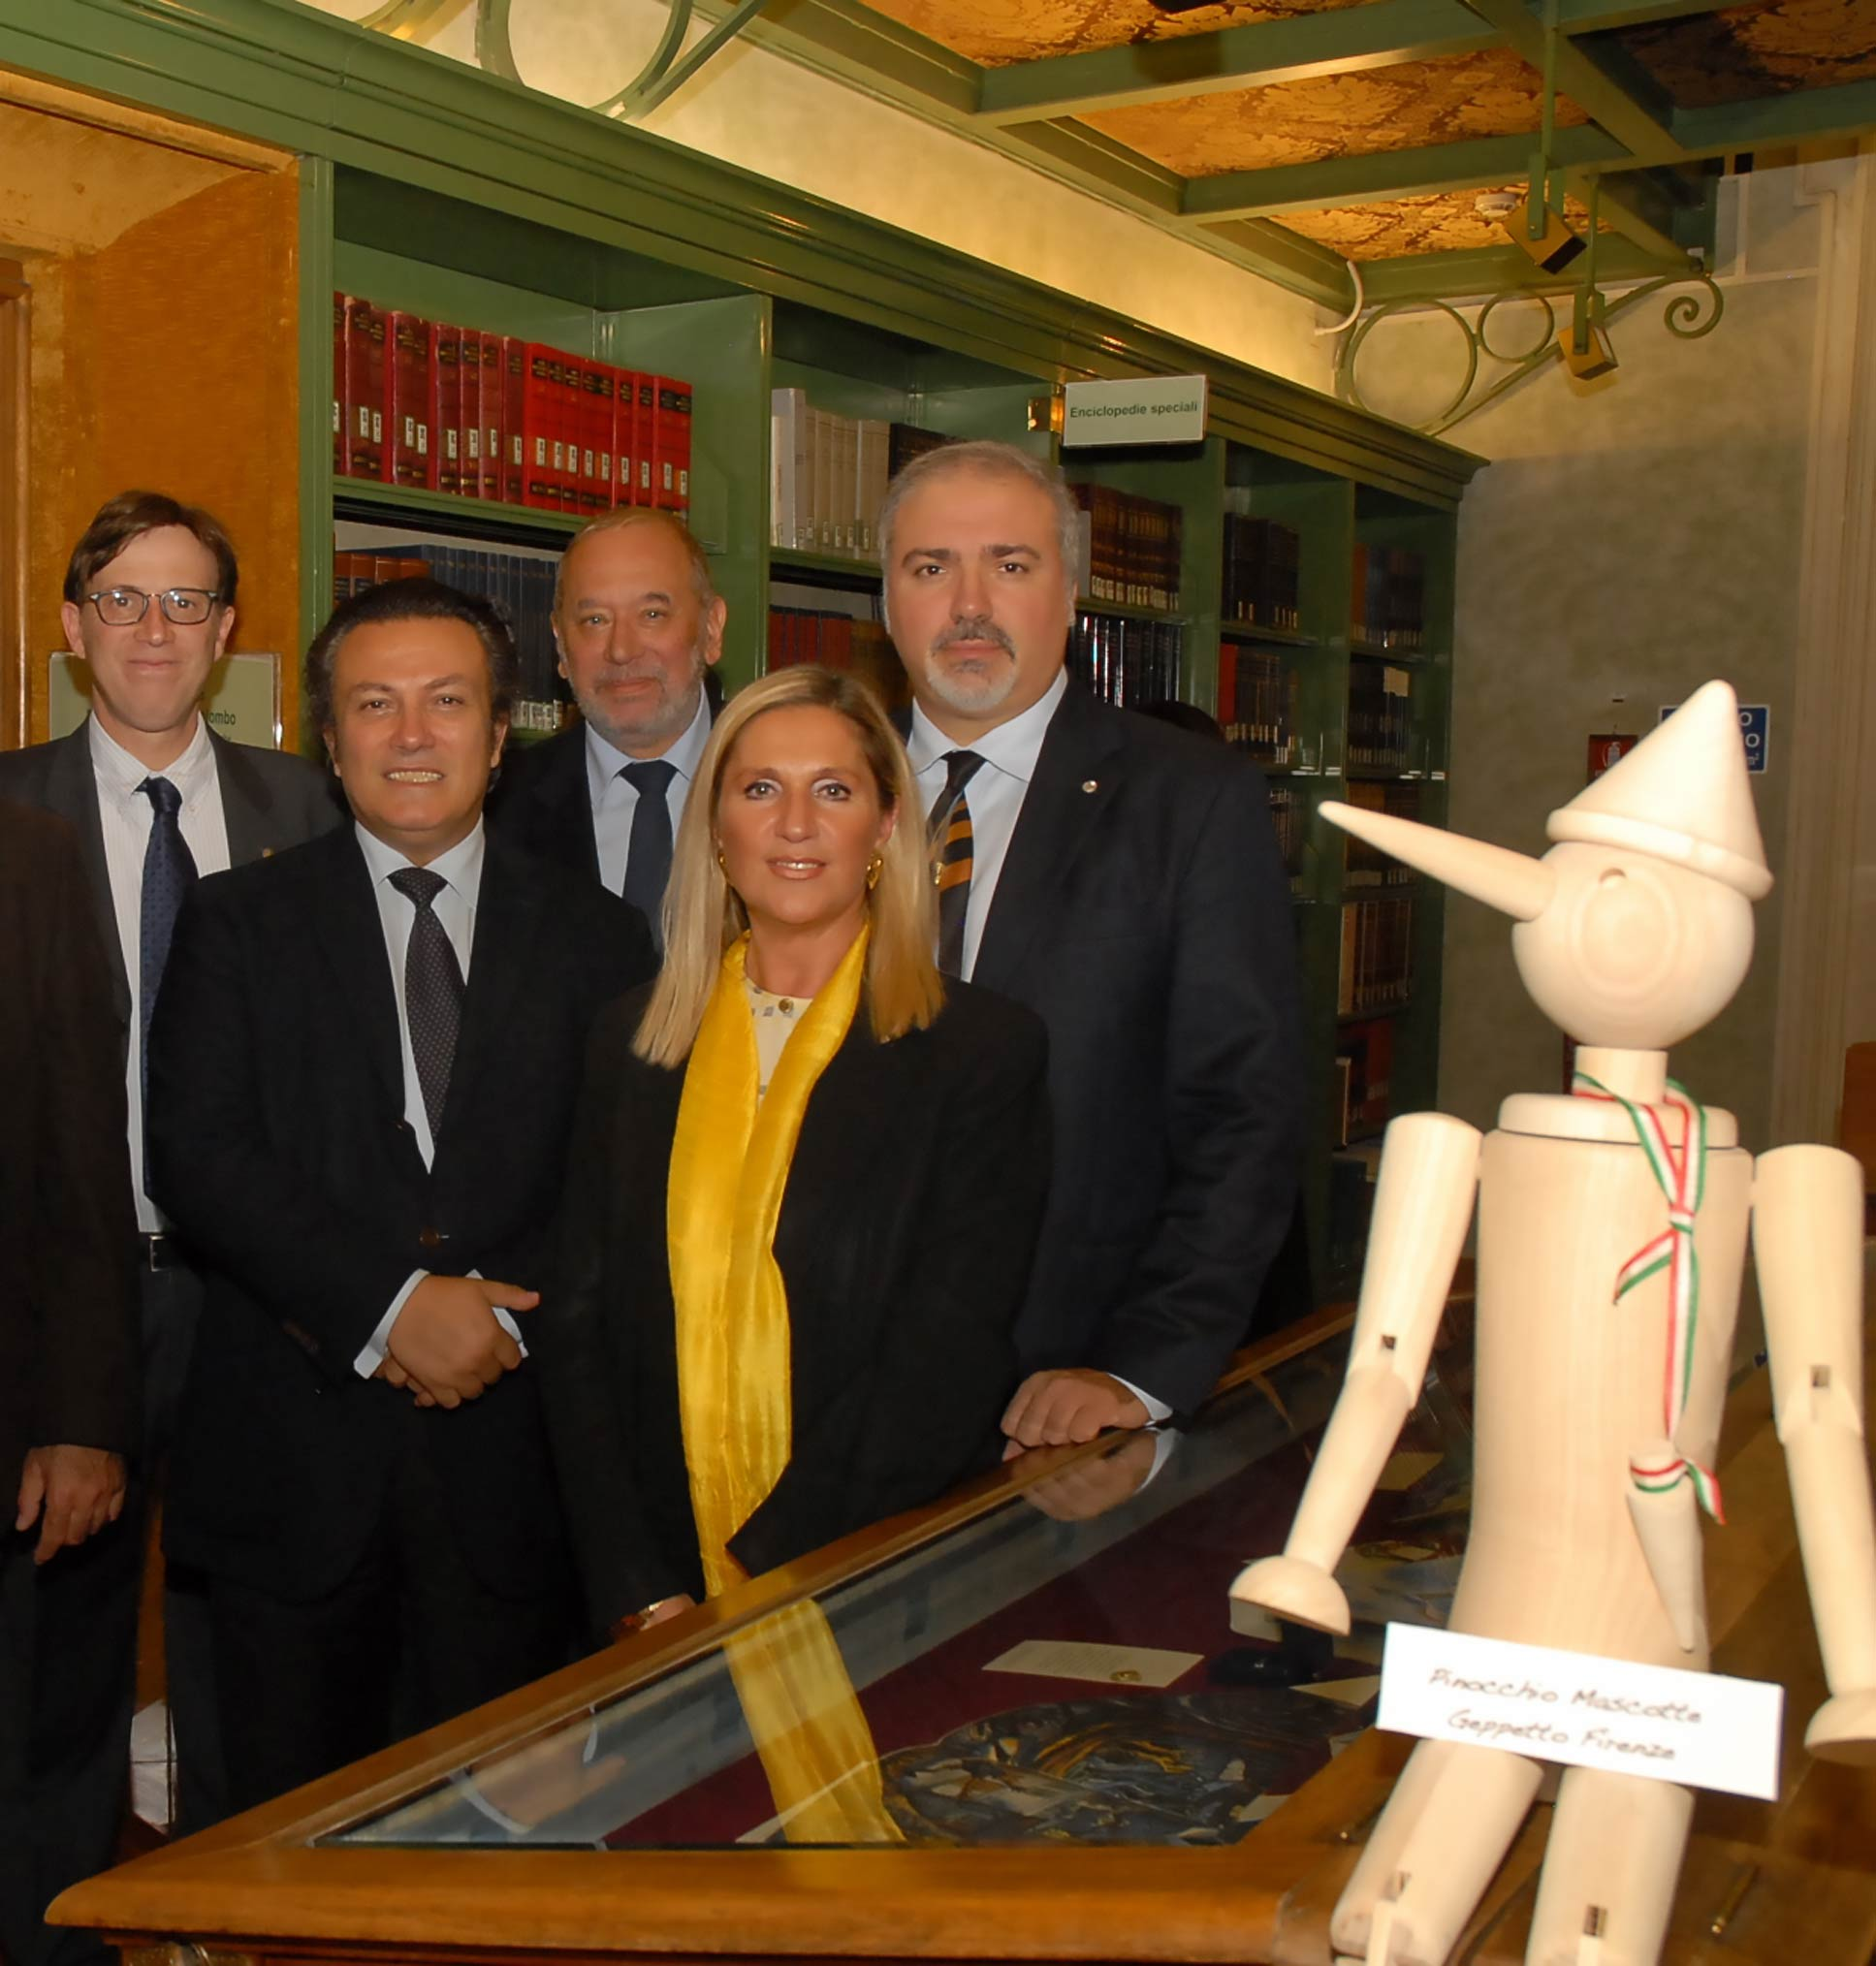 Roma, Camera dei Deputati, Biblioteca S. Macuto, 18 ottobre 2011 – Pinocchio in mostra